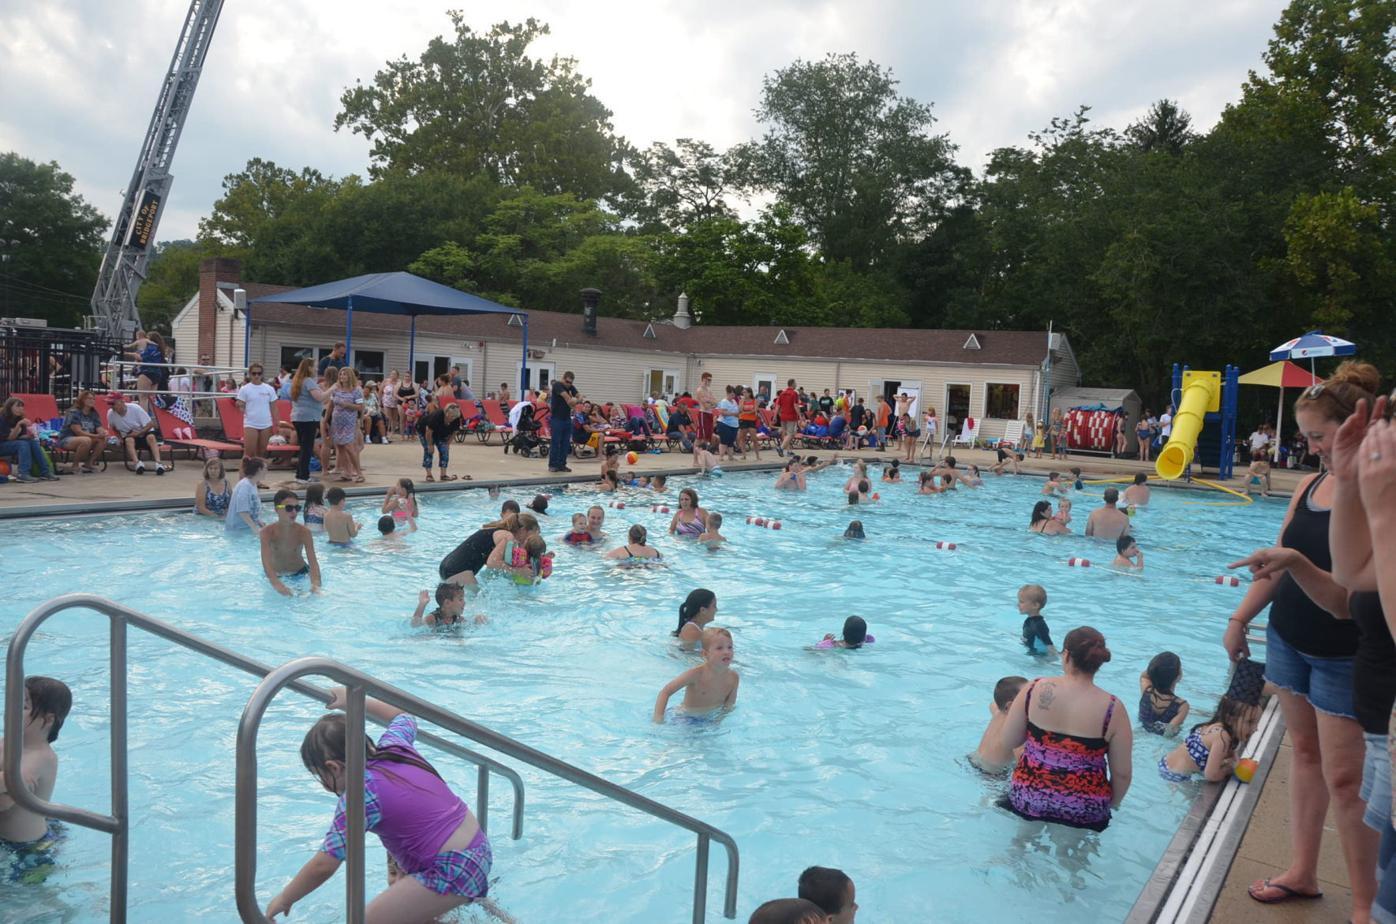 Bridgeport busy pool in 2018 2